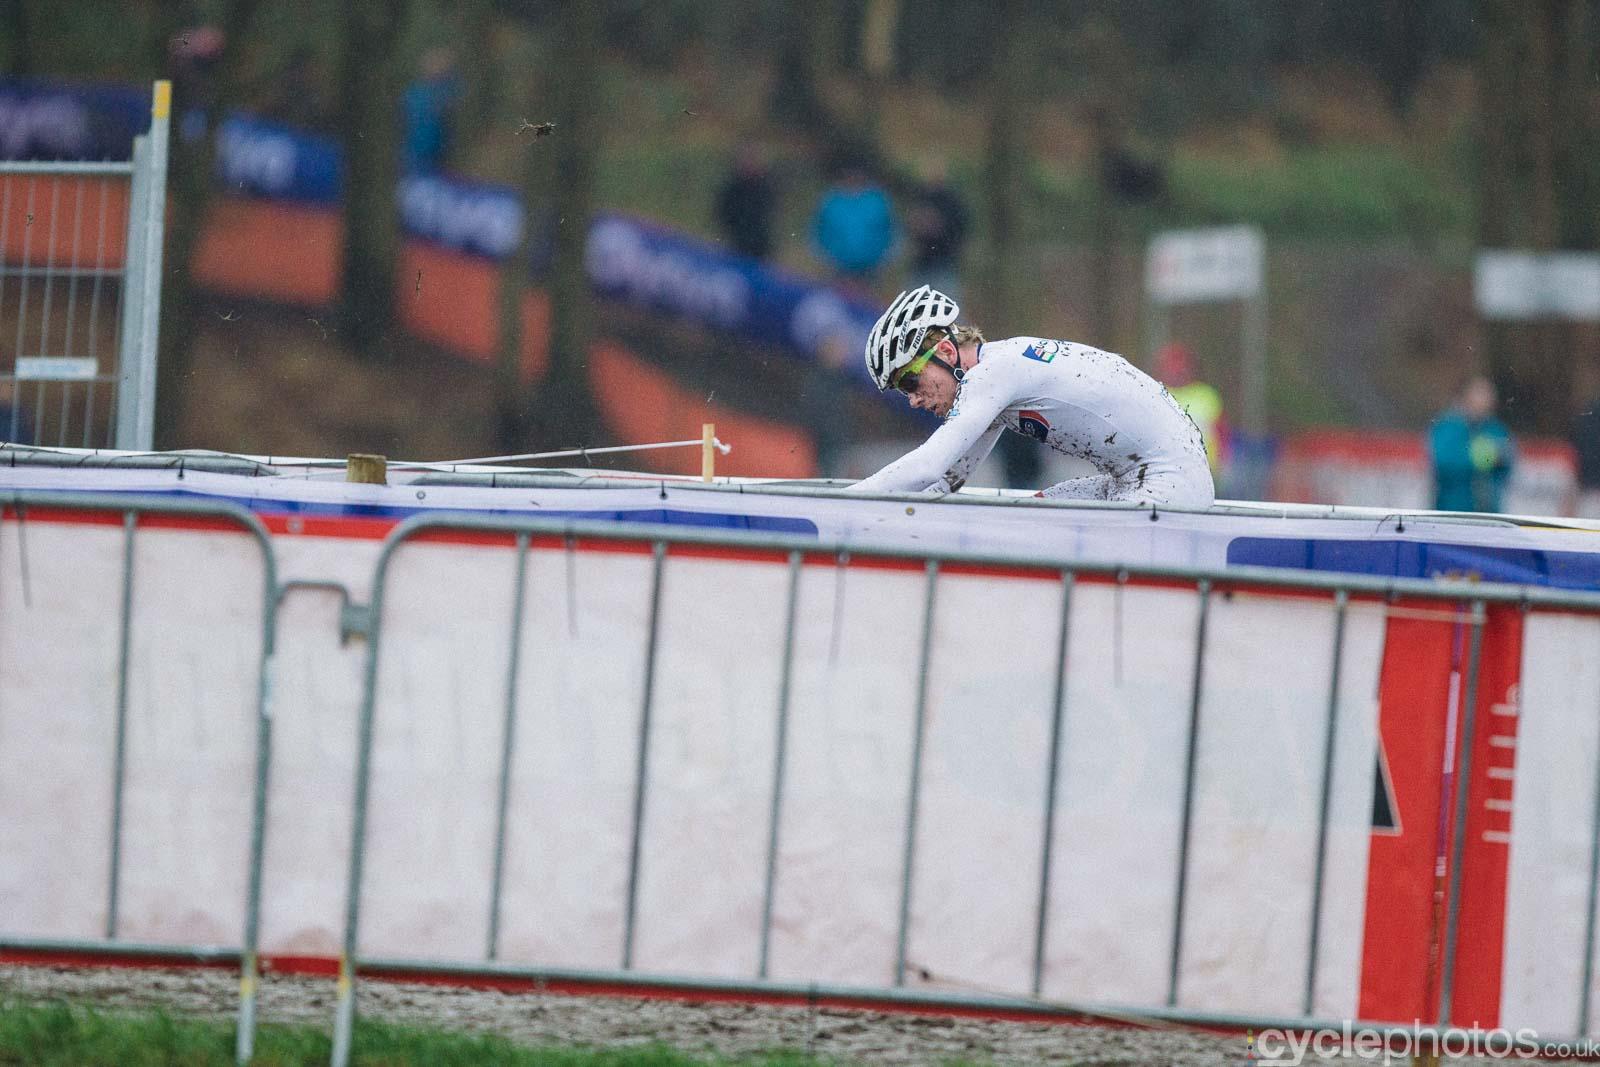 2016-cyclephotos-cyclocross-hoogerheide-113913-eli-iserbyt